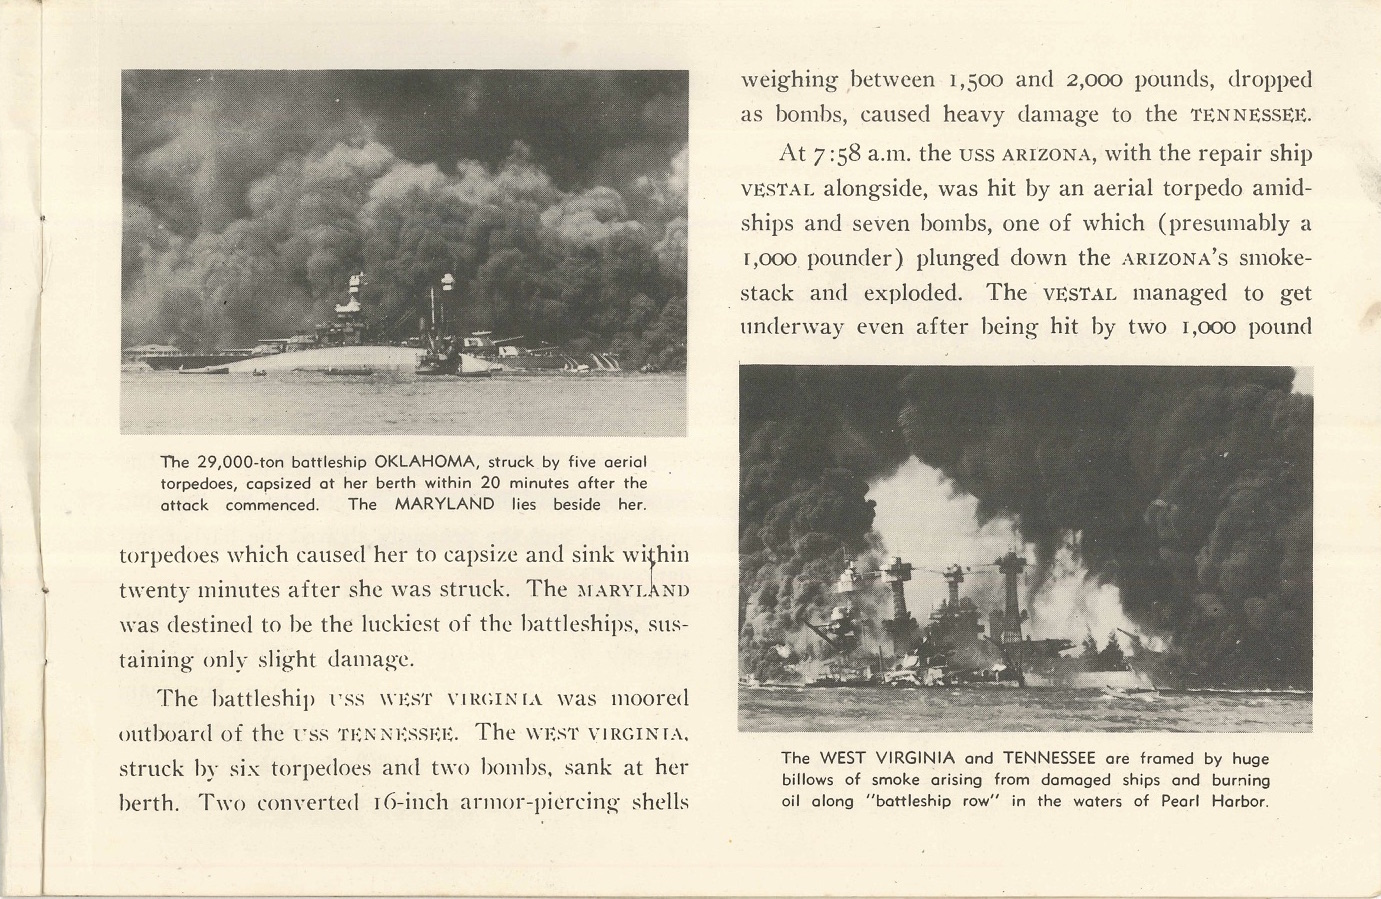 5 5earl Harbor December 7, 1941.jpg